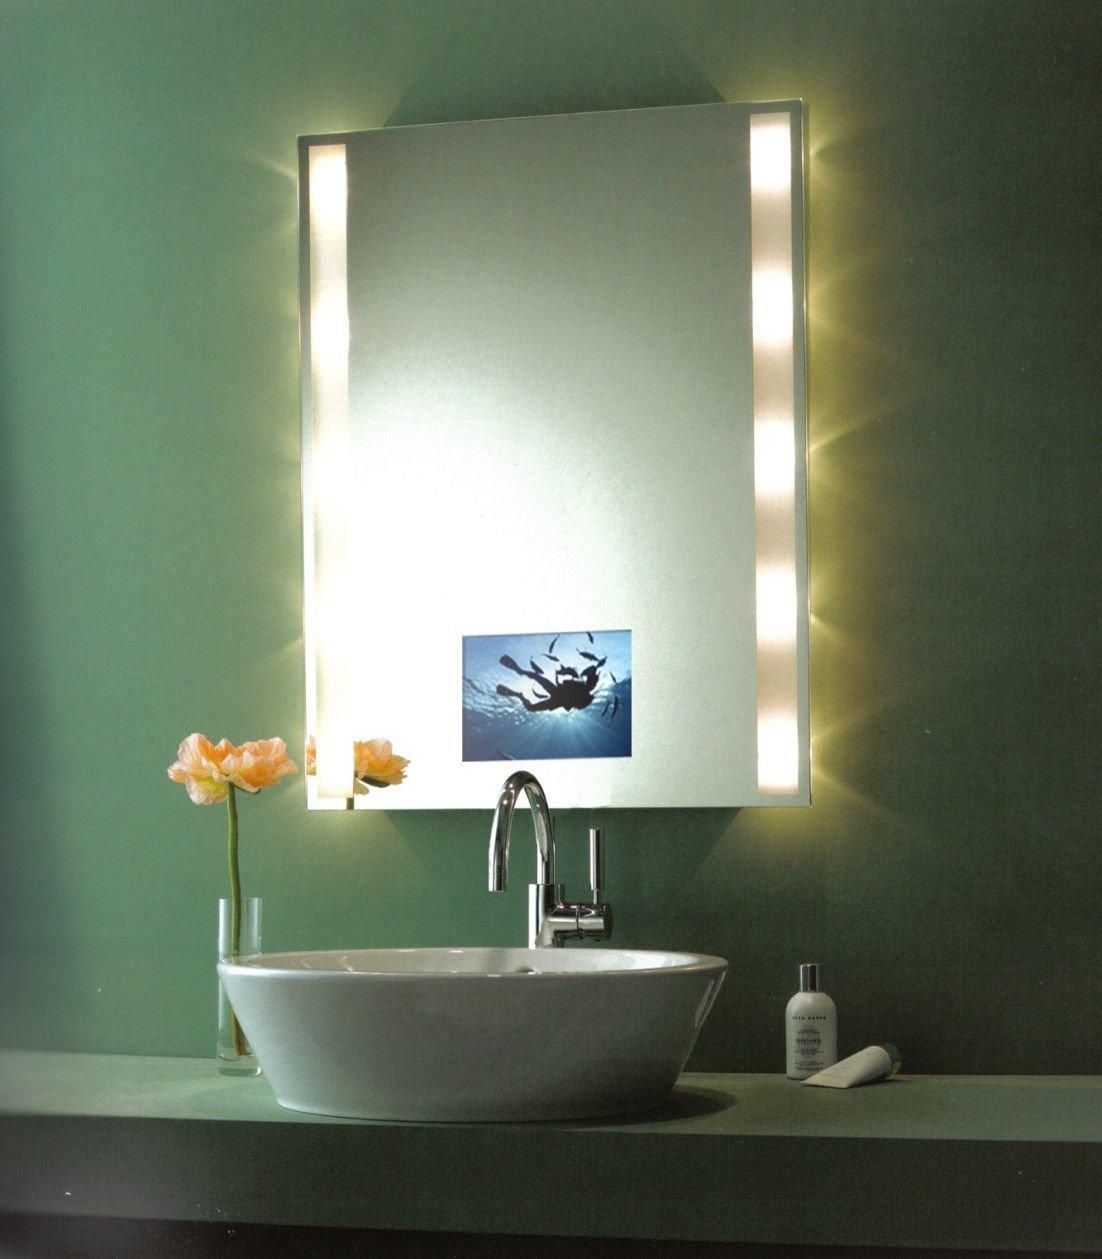 Подсветка зеркала в ванной комнате картинки